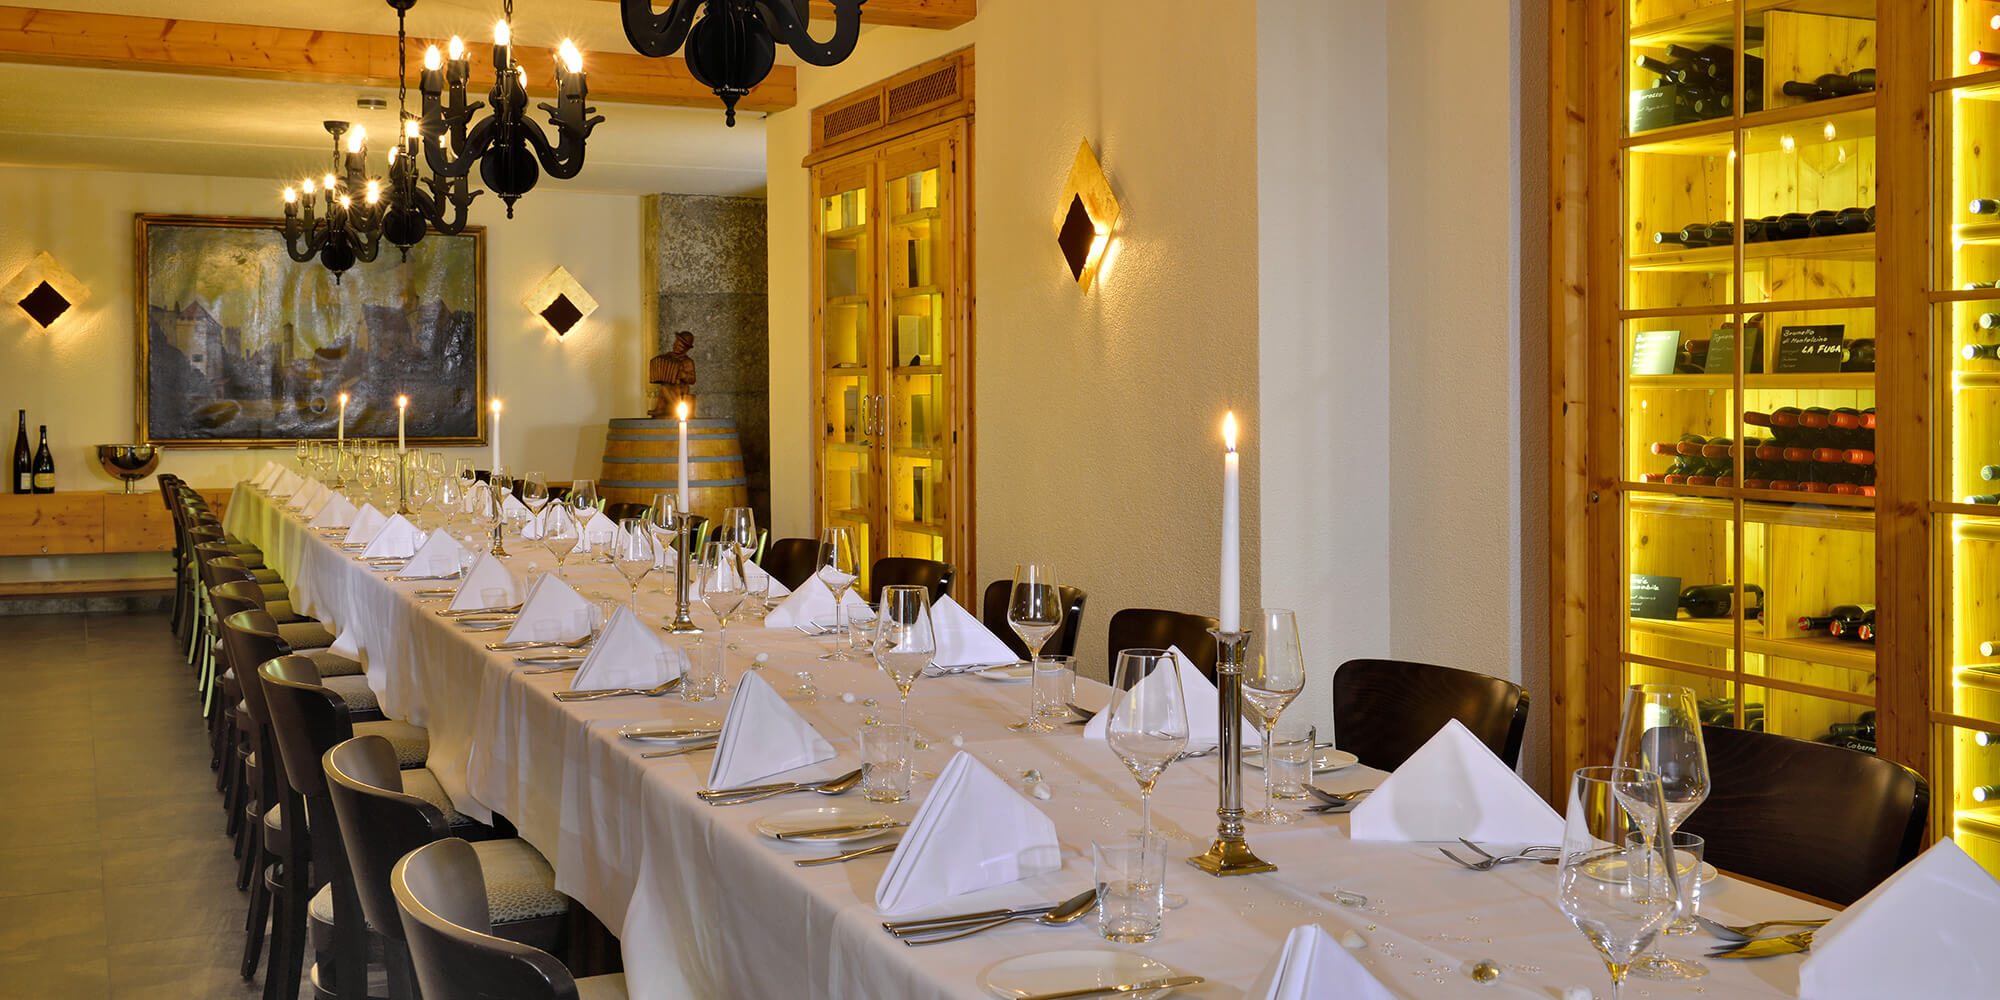 GranCanariaFoto-Hotel-Restaurant-Dirk-Holst-DHSTUDIO-407